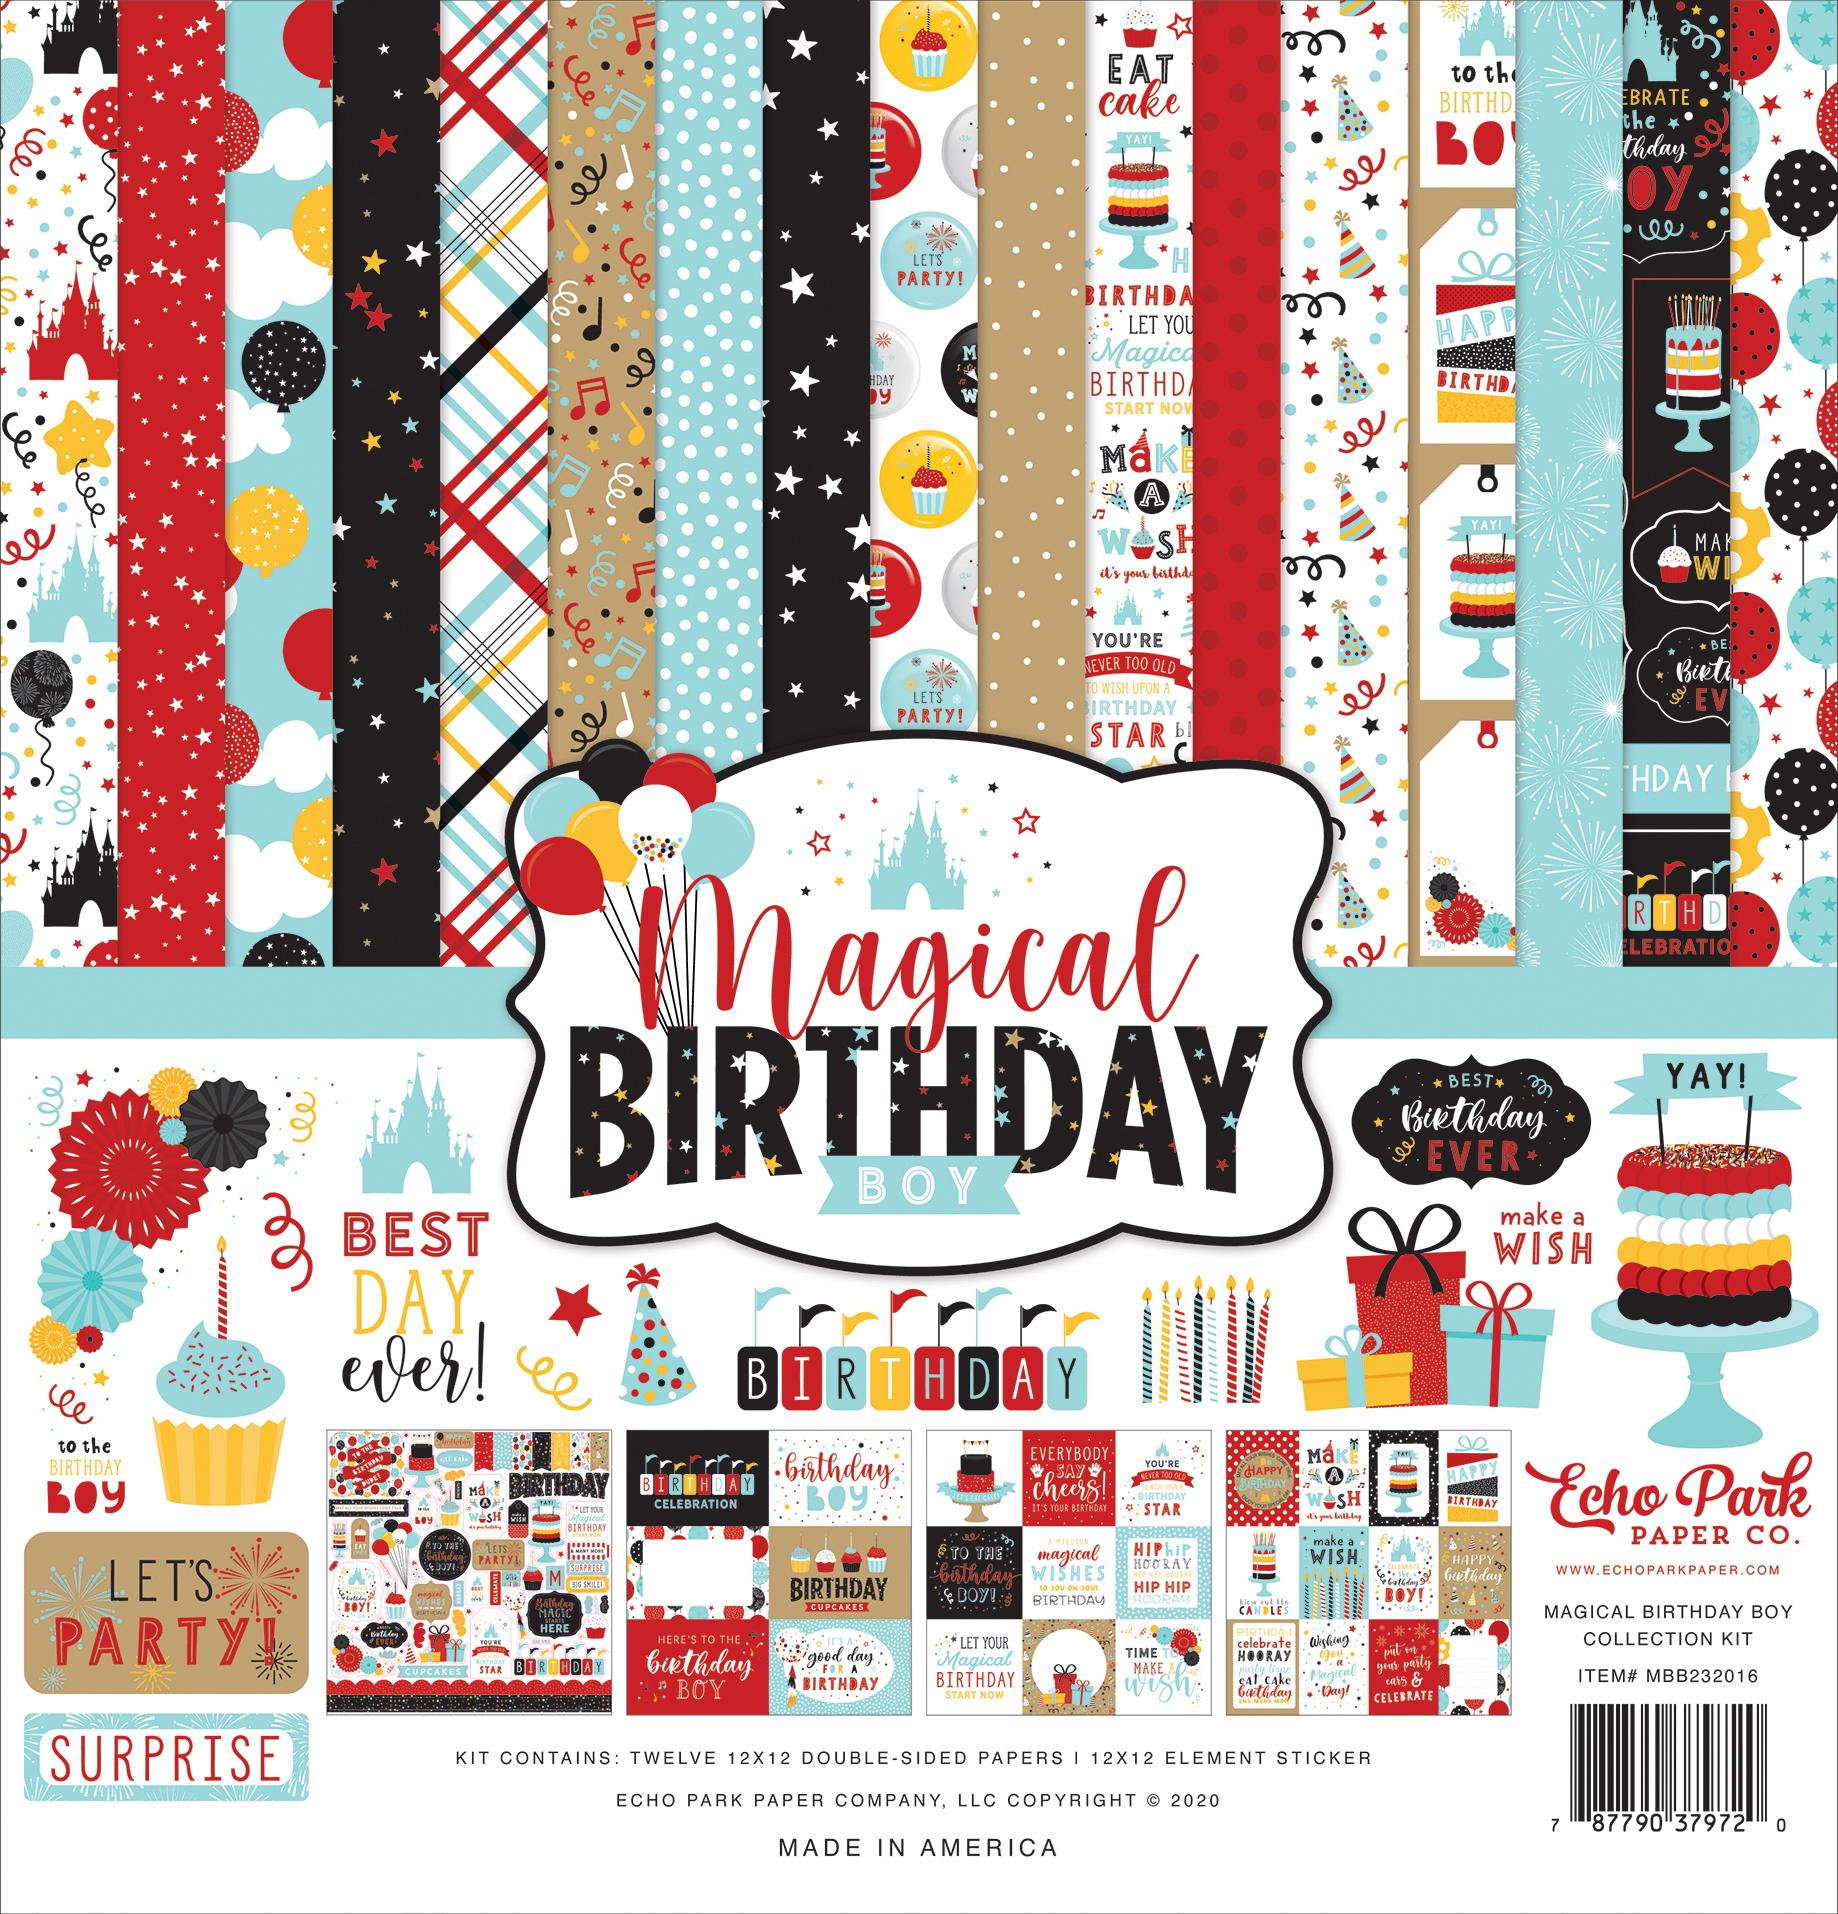 Magical Birthday Boy Collection Kit